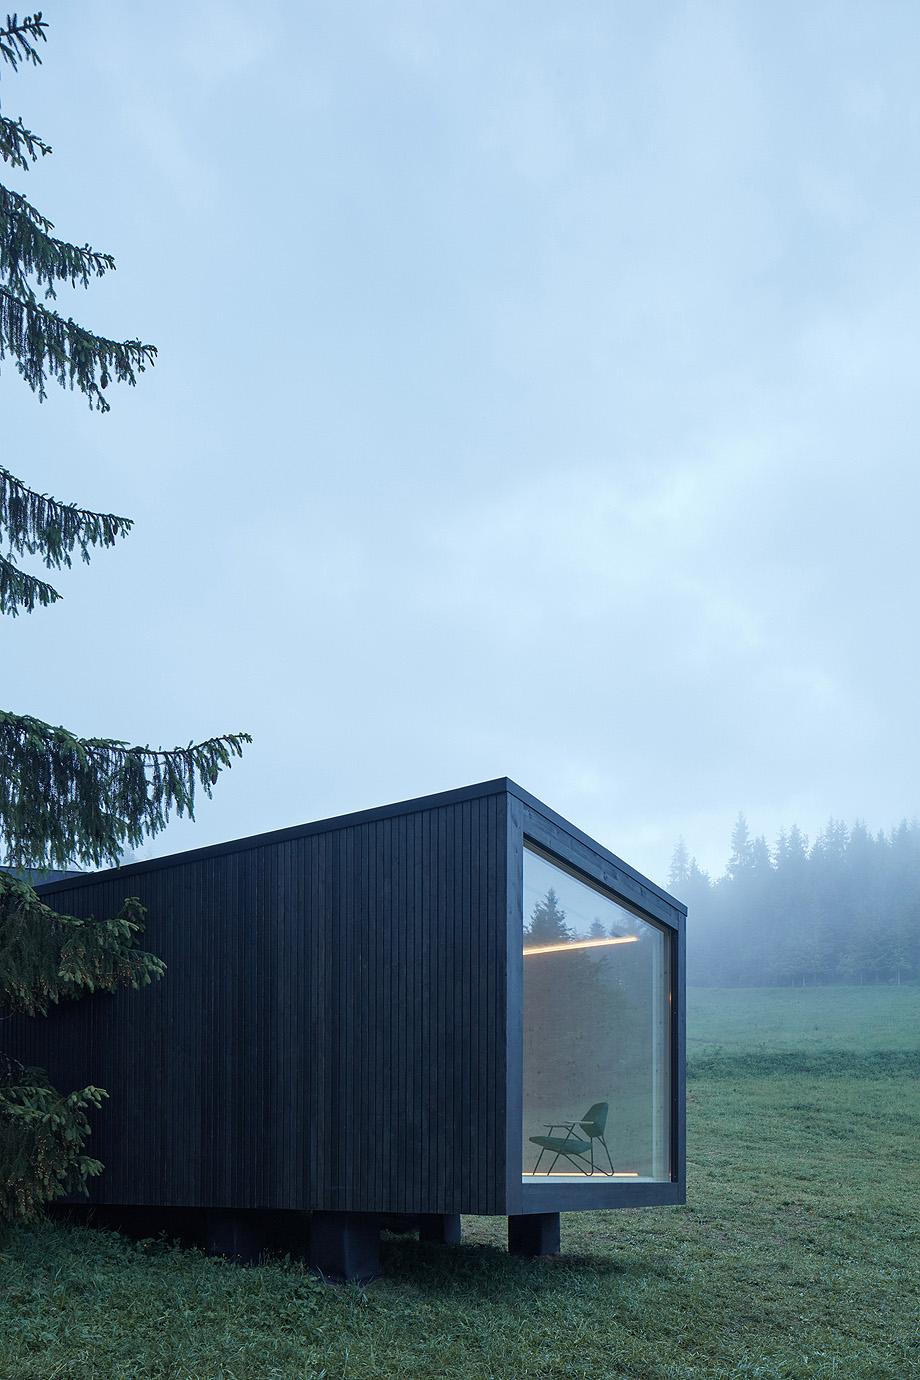 cabaña en eslovaquia de ark shelter - foto boysplaynice (3)